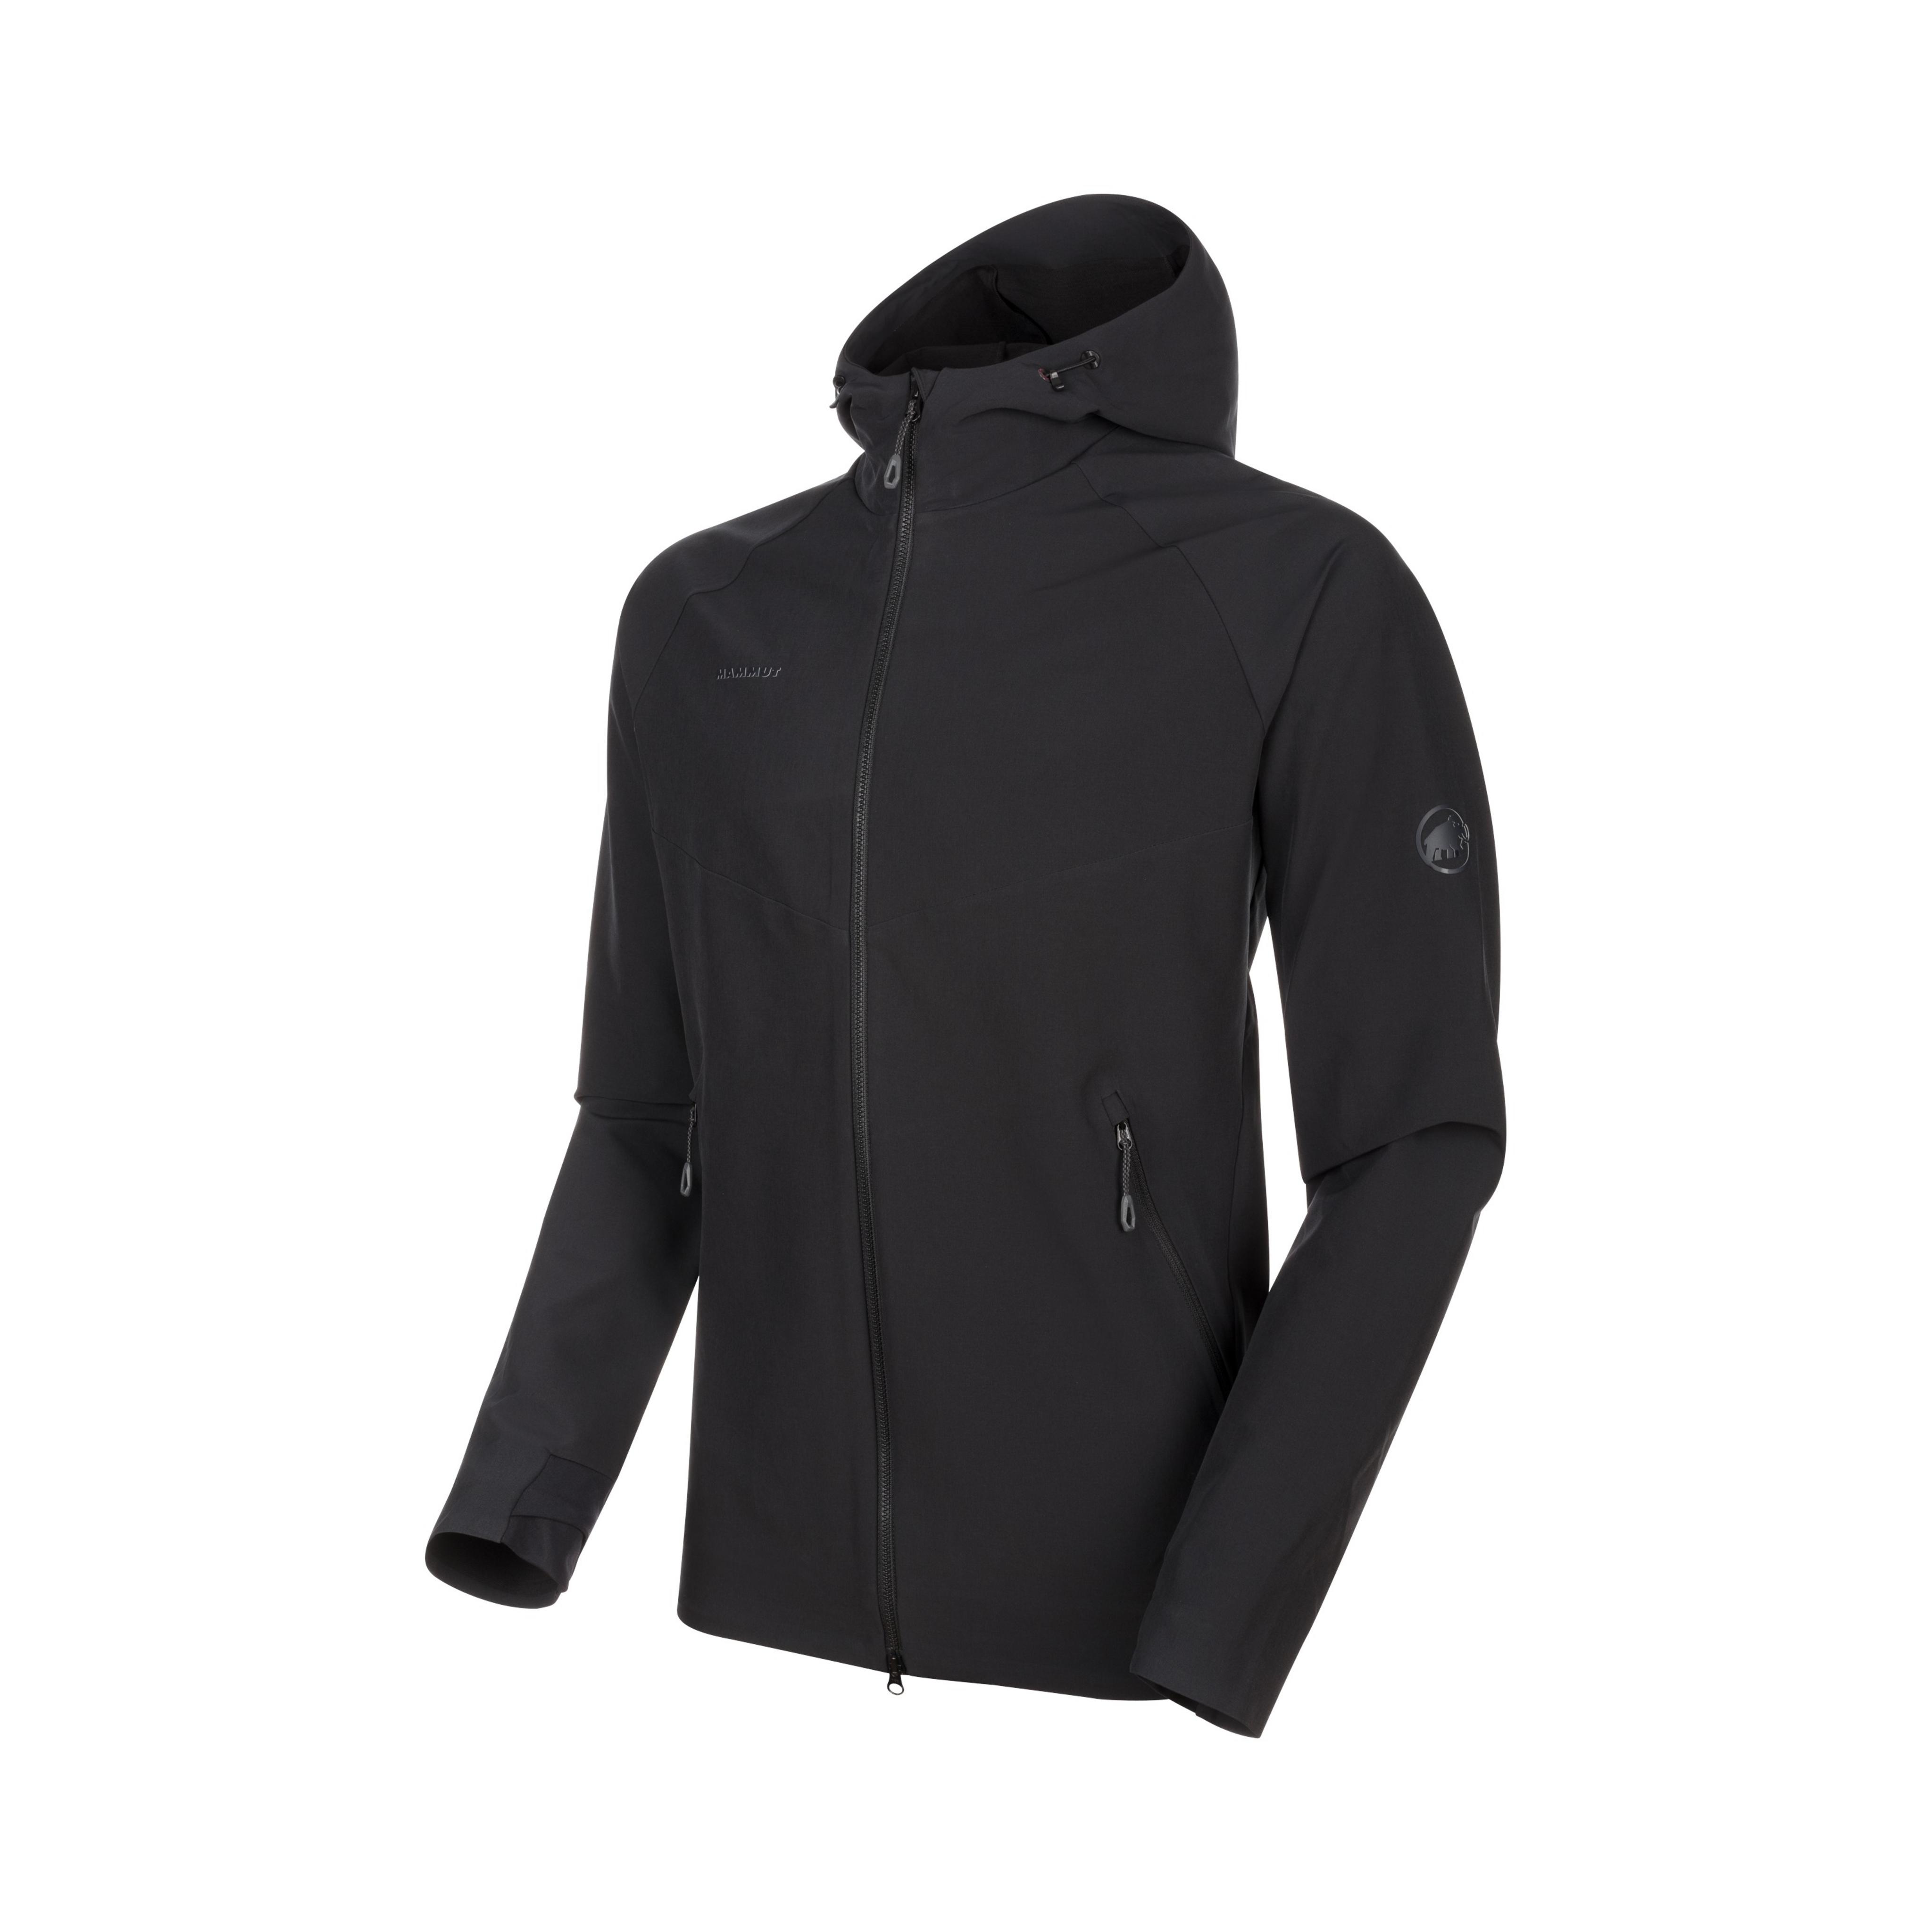 Macun SO Hooded Jacket Men - black, M thumbnail